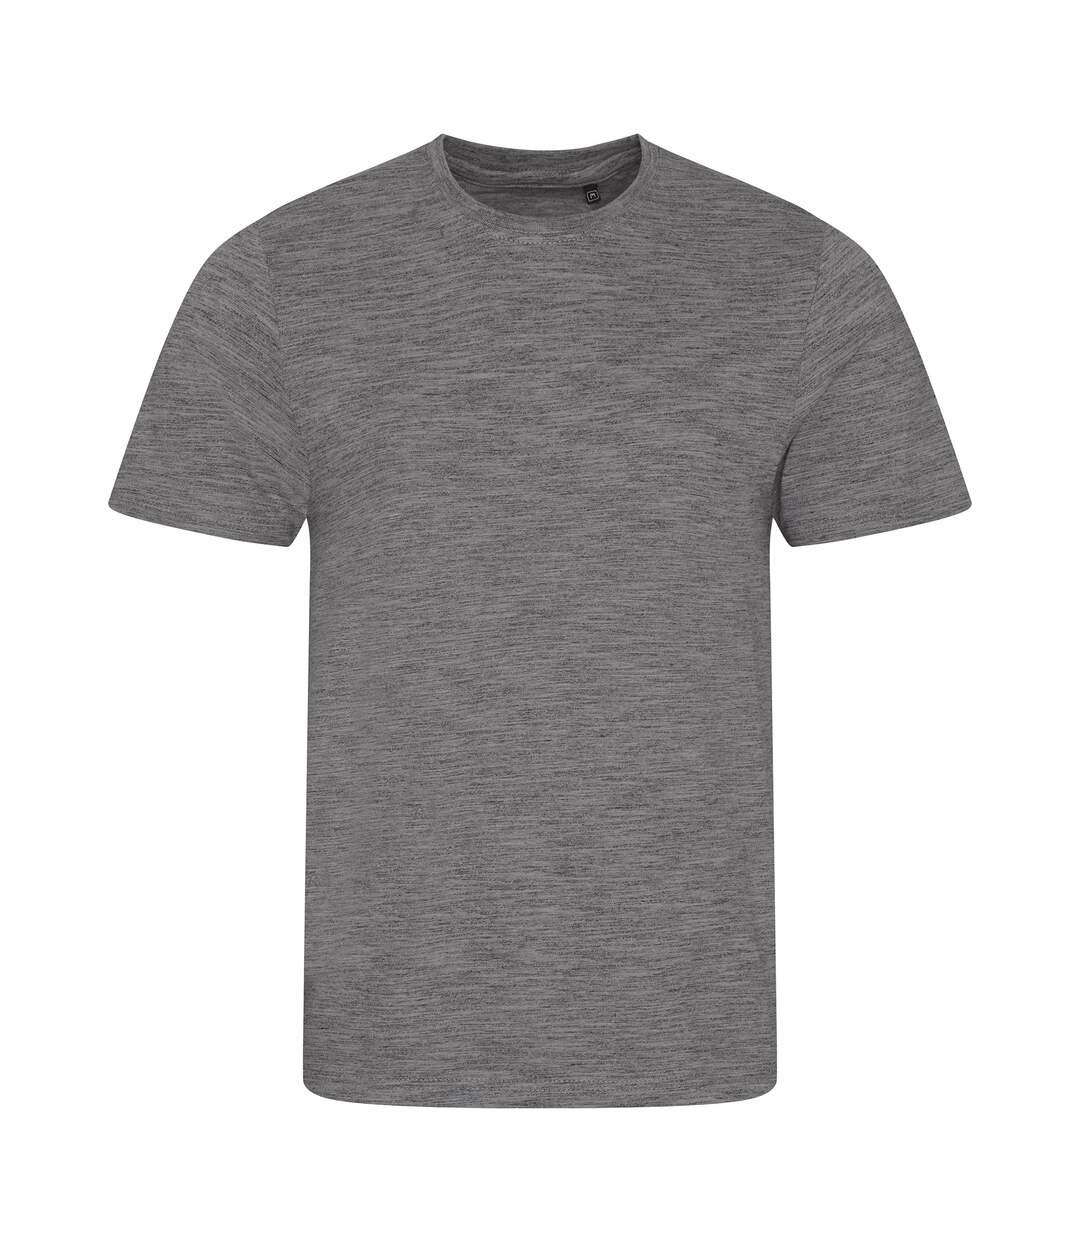 AWDis Mens Cosmic Blend T-Shirt (Cosmic Heather/Cosmic Black) - UTPC2977